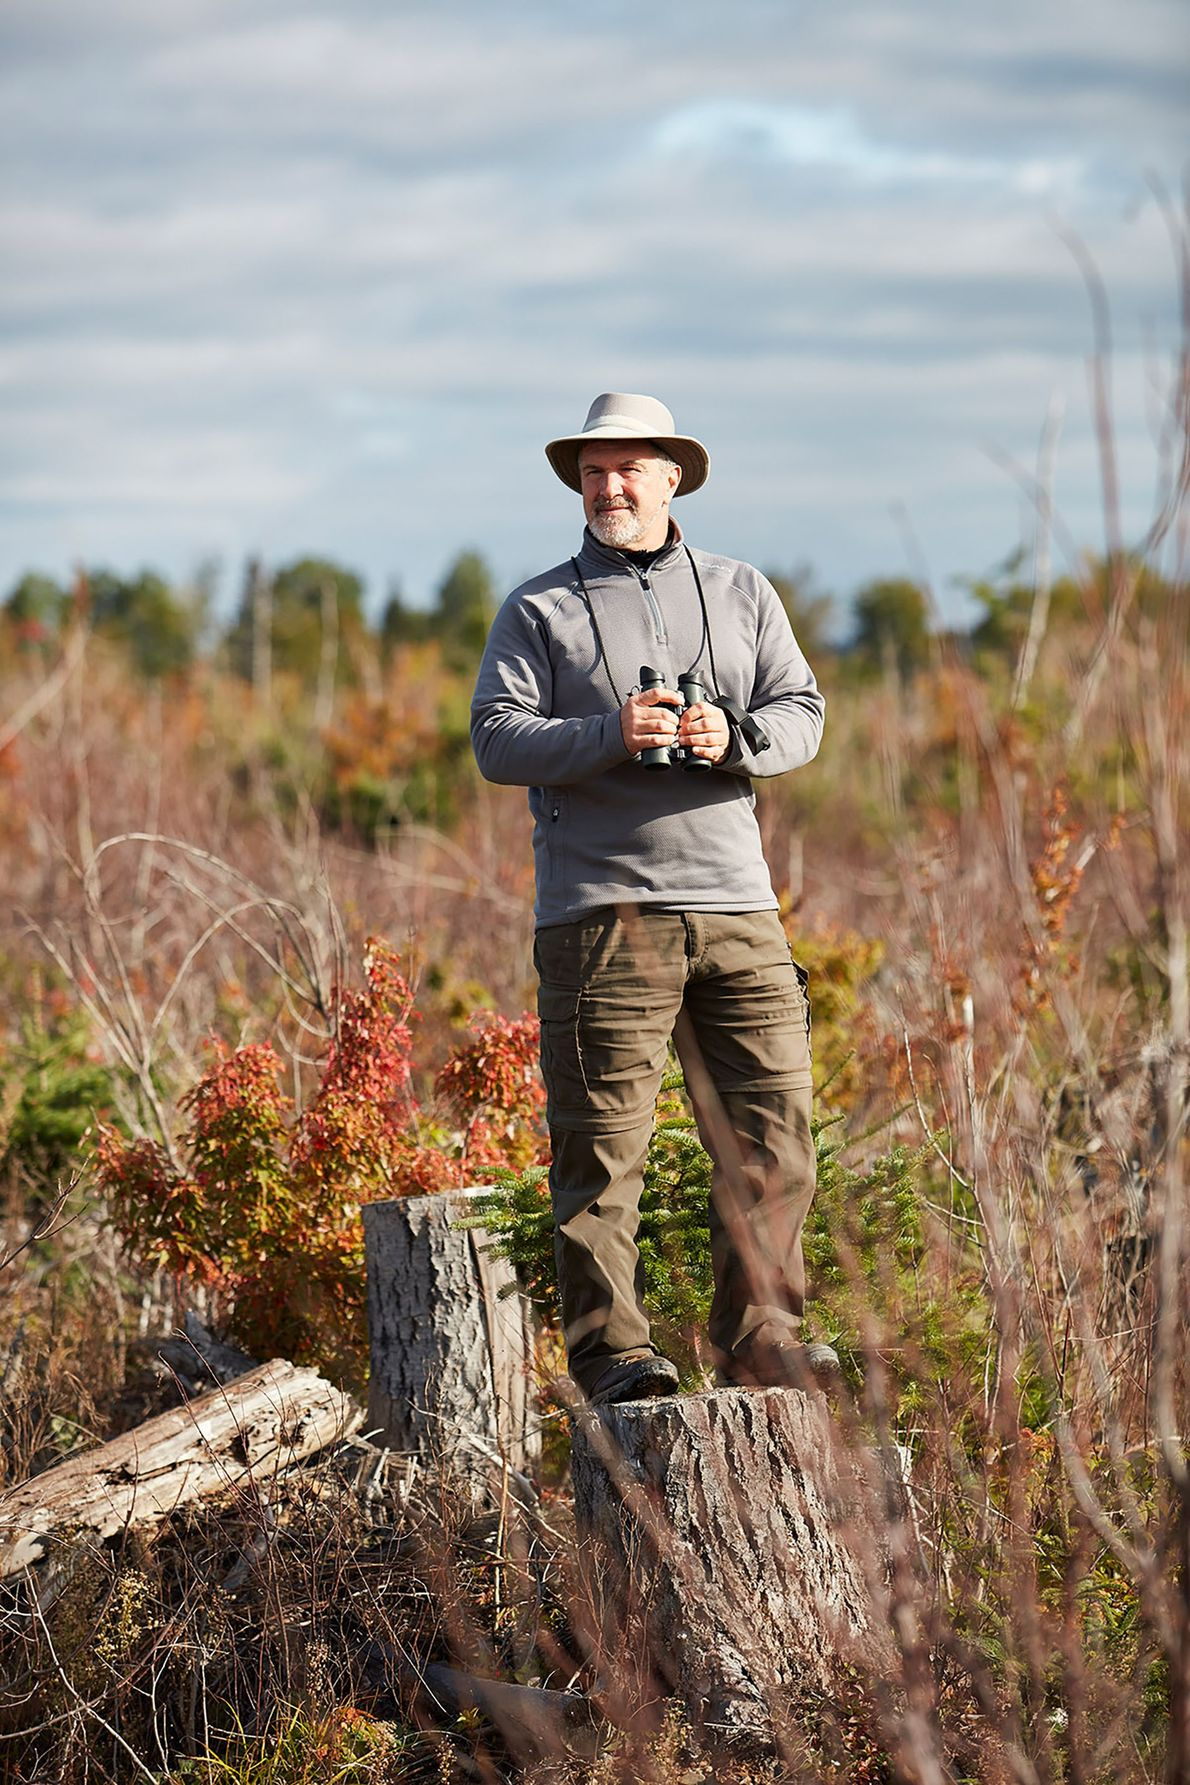 A portrait of Alain Clavette, one of Canada's premier bird watchers.